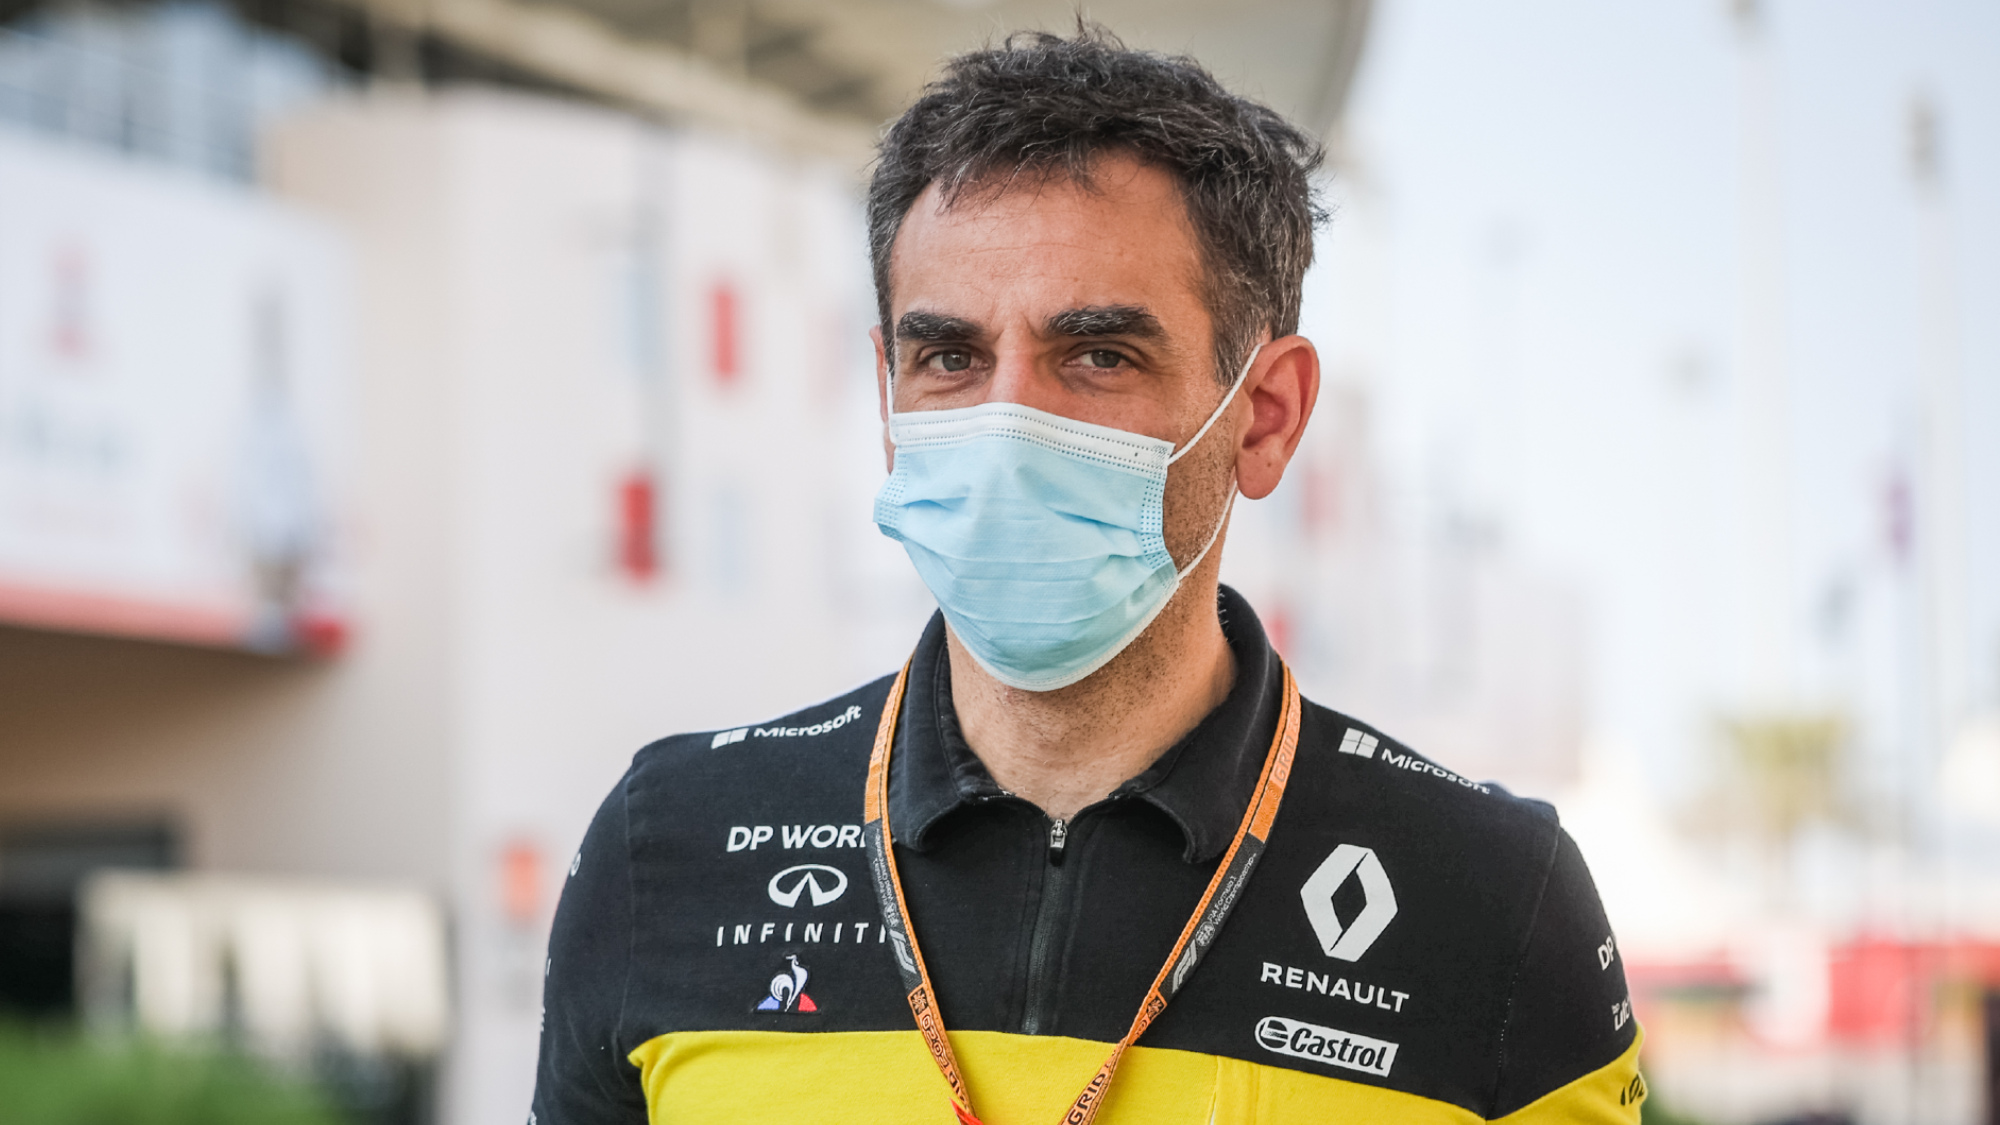 Cyril Abiteboul, Renault F1 2020